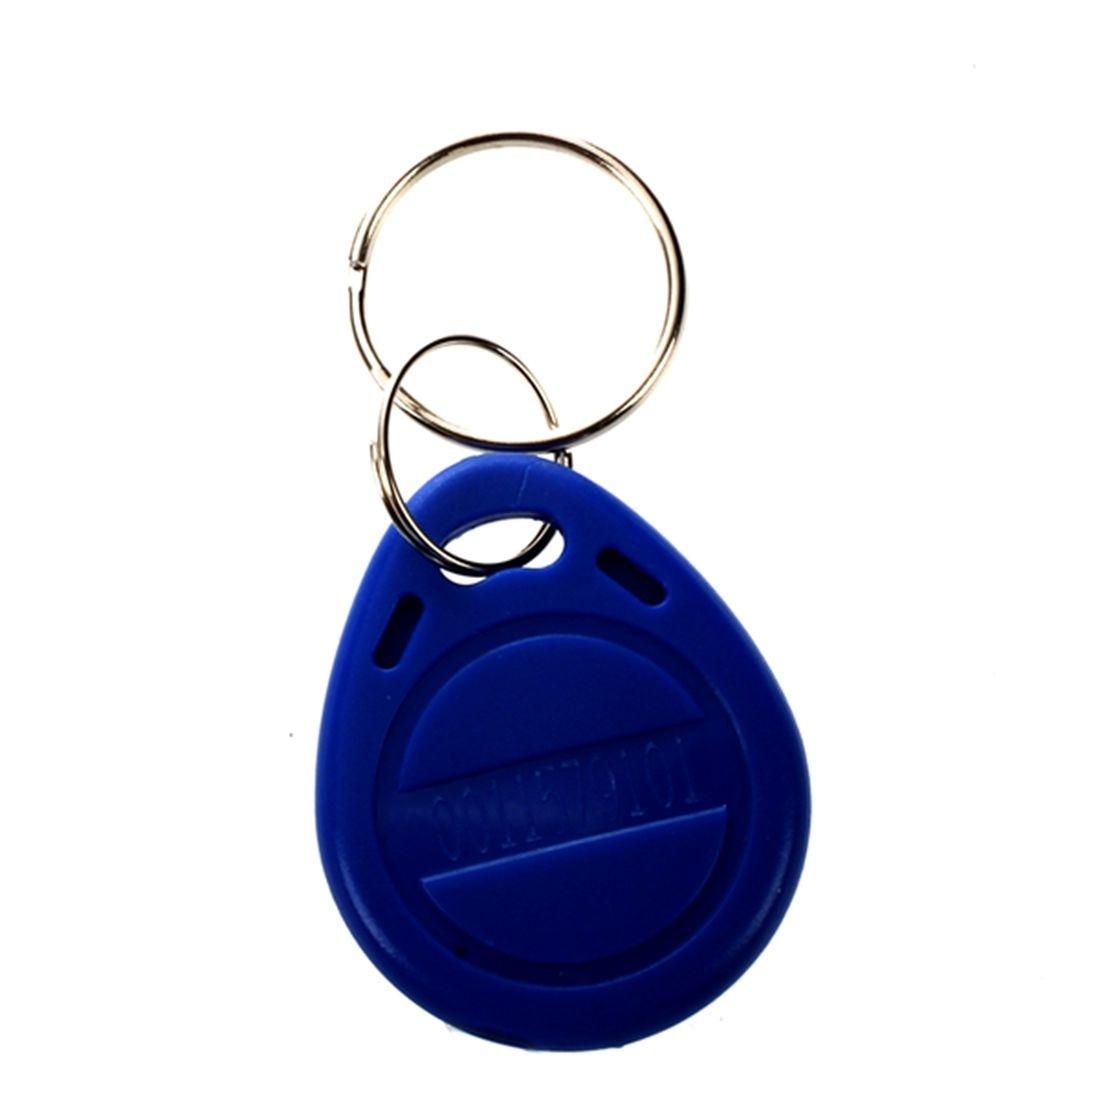 10pcs 125khz Rfid Proximity Id Token Key Tag Keychain Waterproof New Fine Craftsmanship